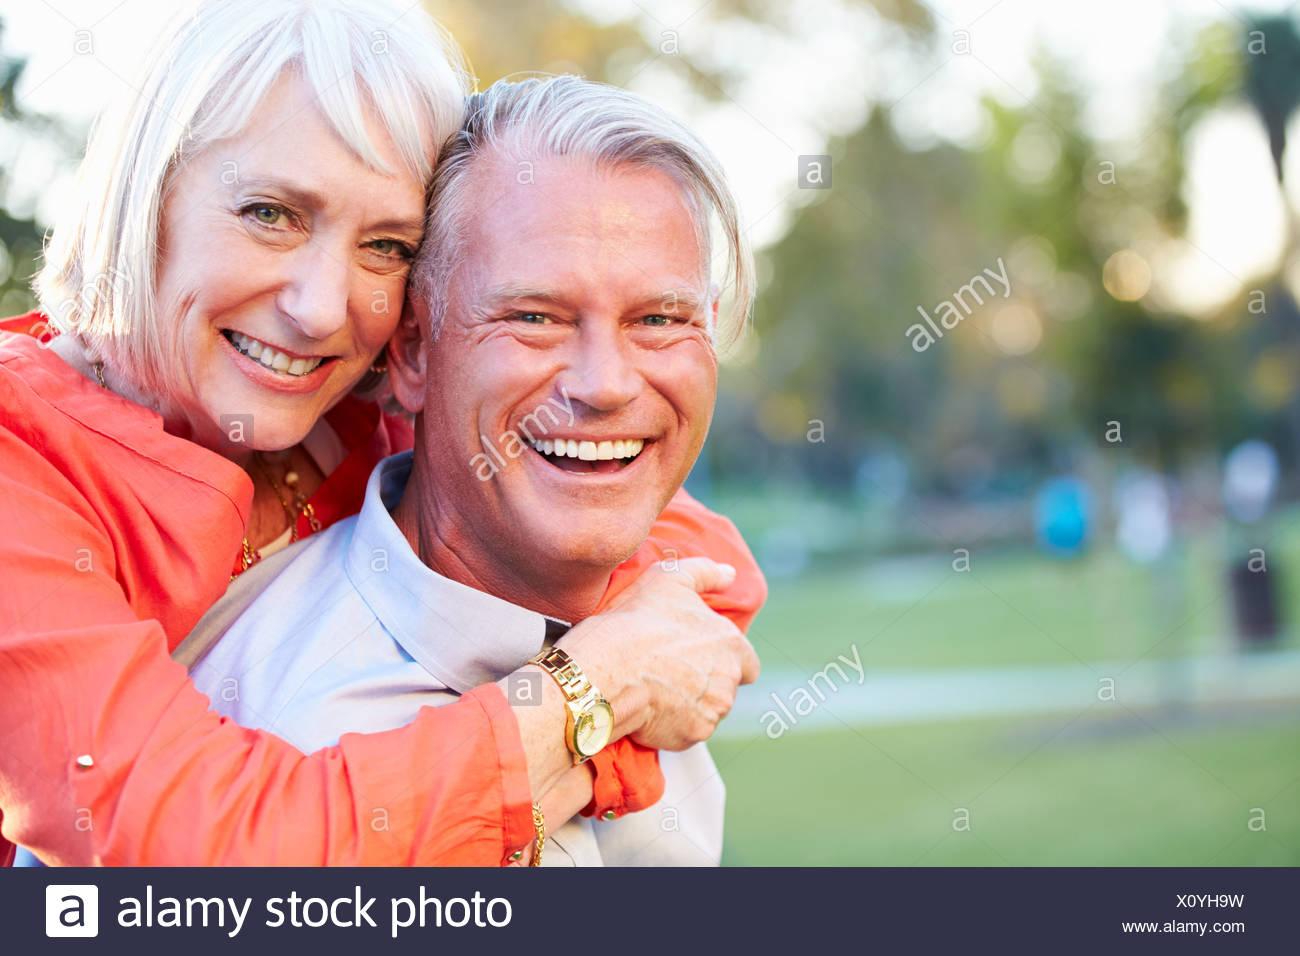 outdoor portrait of romantic mature couple in park stock photo